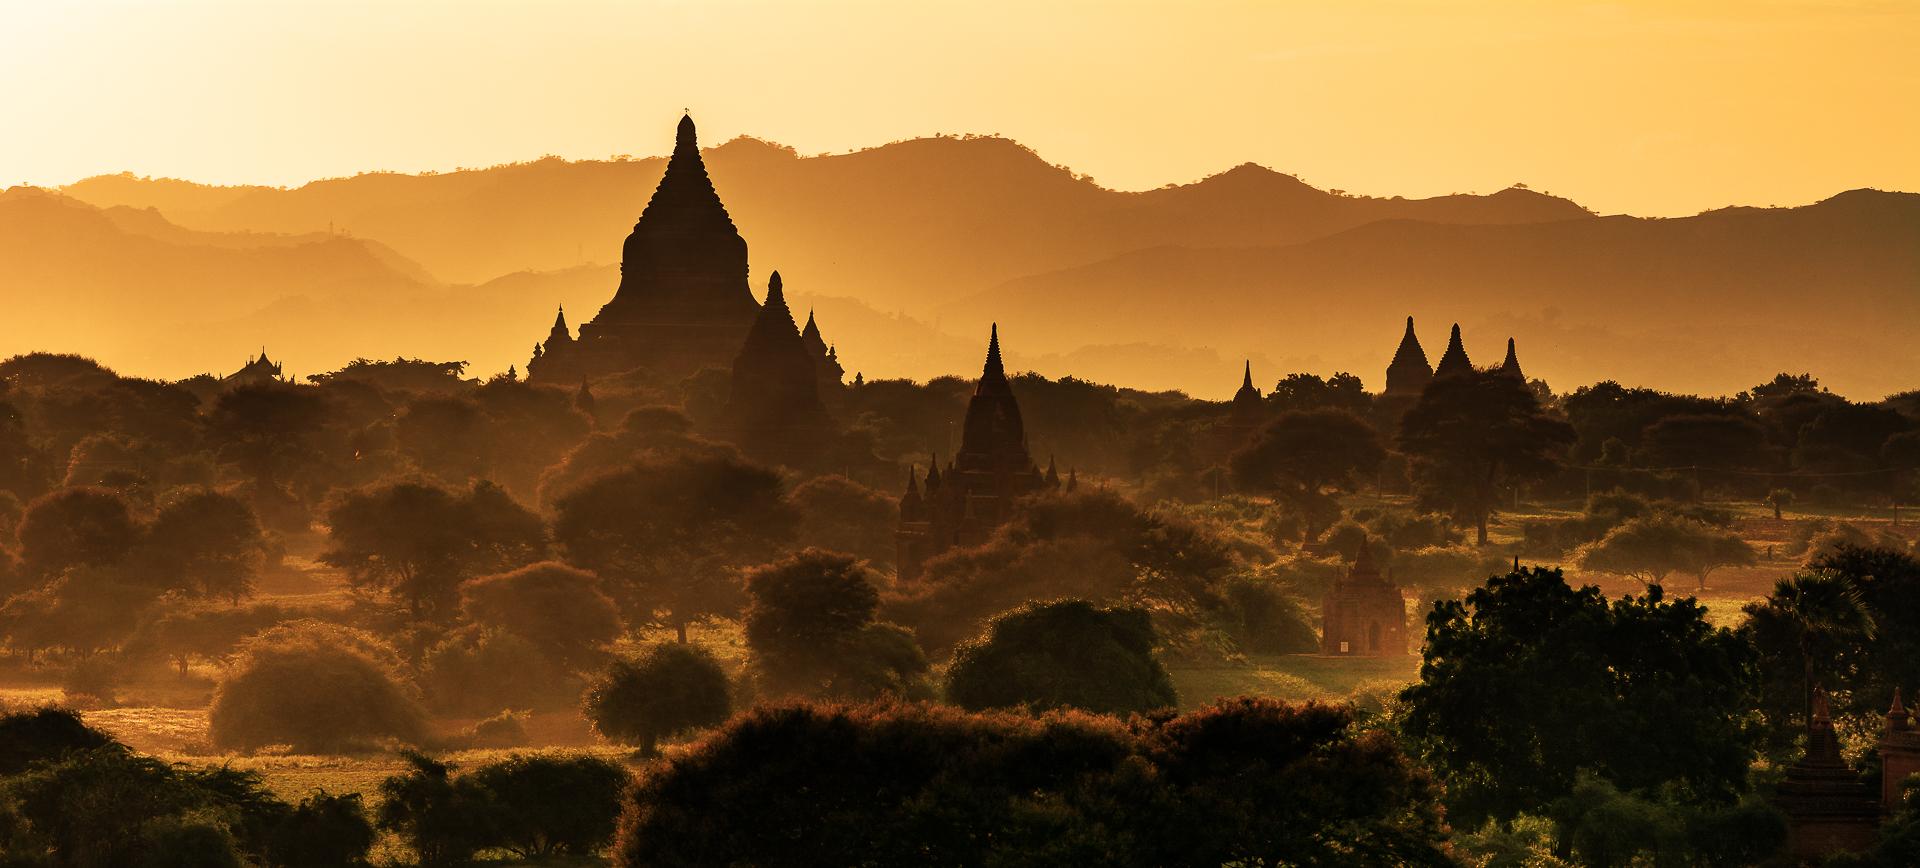 Myanmar, Burma, Travel, Landscape, nature, Urban, City, Around the World, Reisen, Asia, Asien, Bagan, Temple,